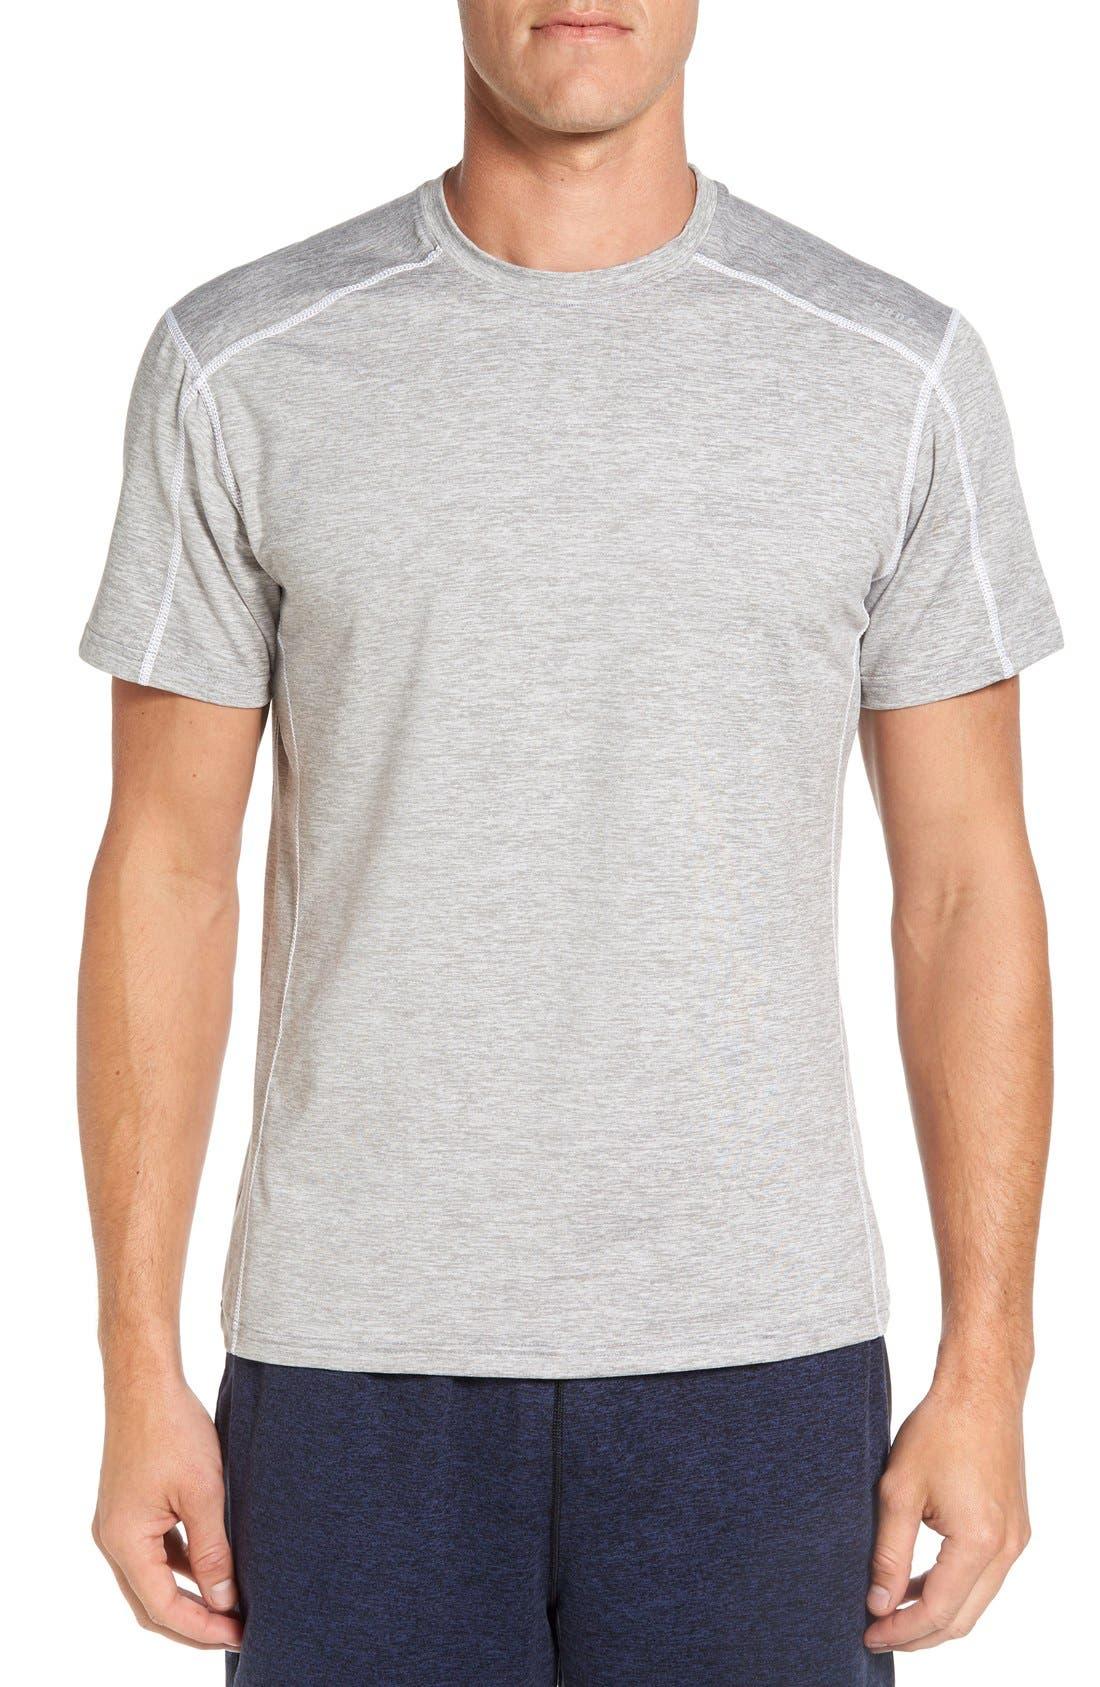 'Cooldown' Moisture Wicking Training T-Shirt,                             Main thumbnail 1, color,                             030